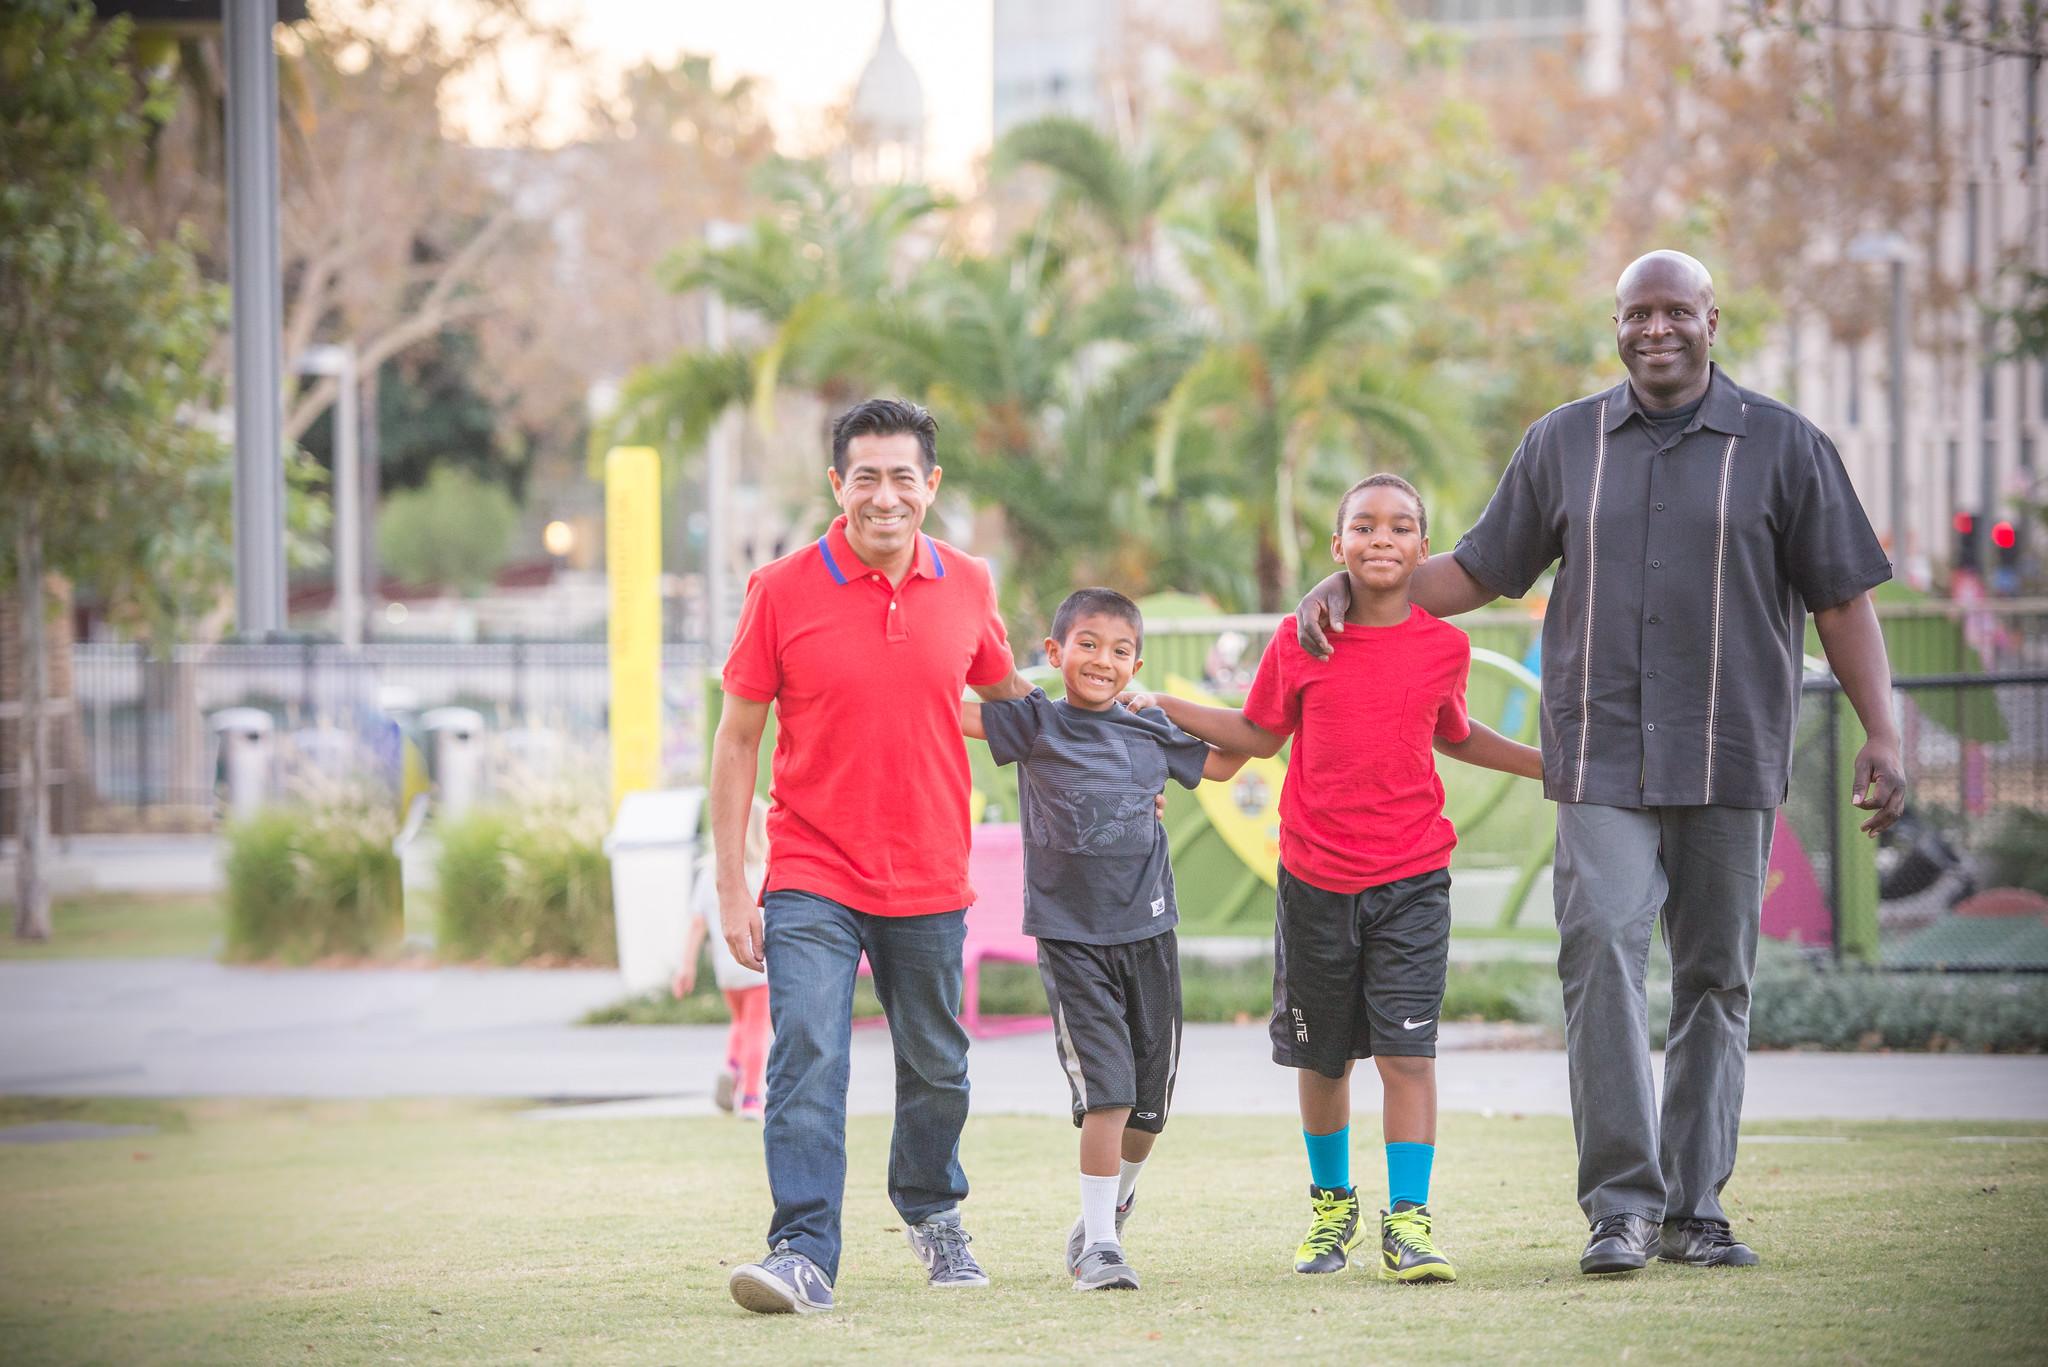 LBGTQ + 학부모 지원 : 자료 및 학부모 이야기